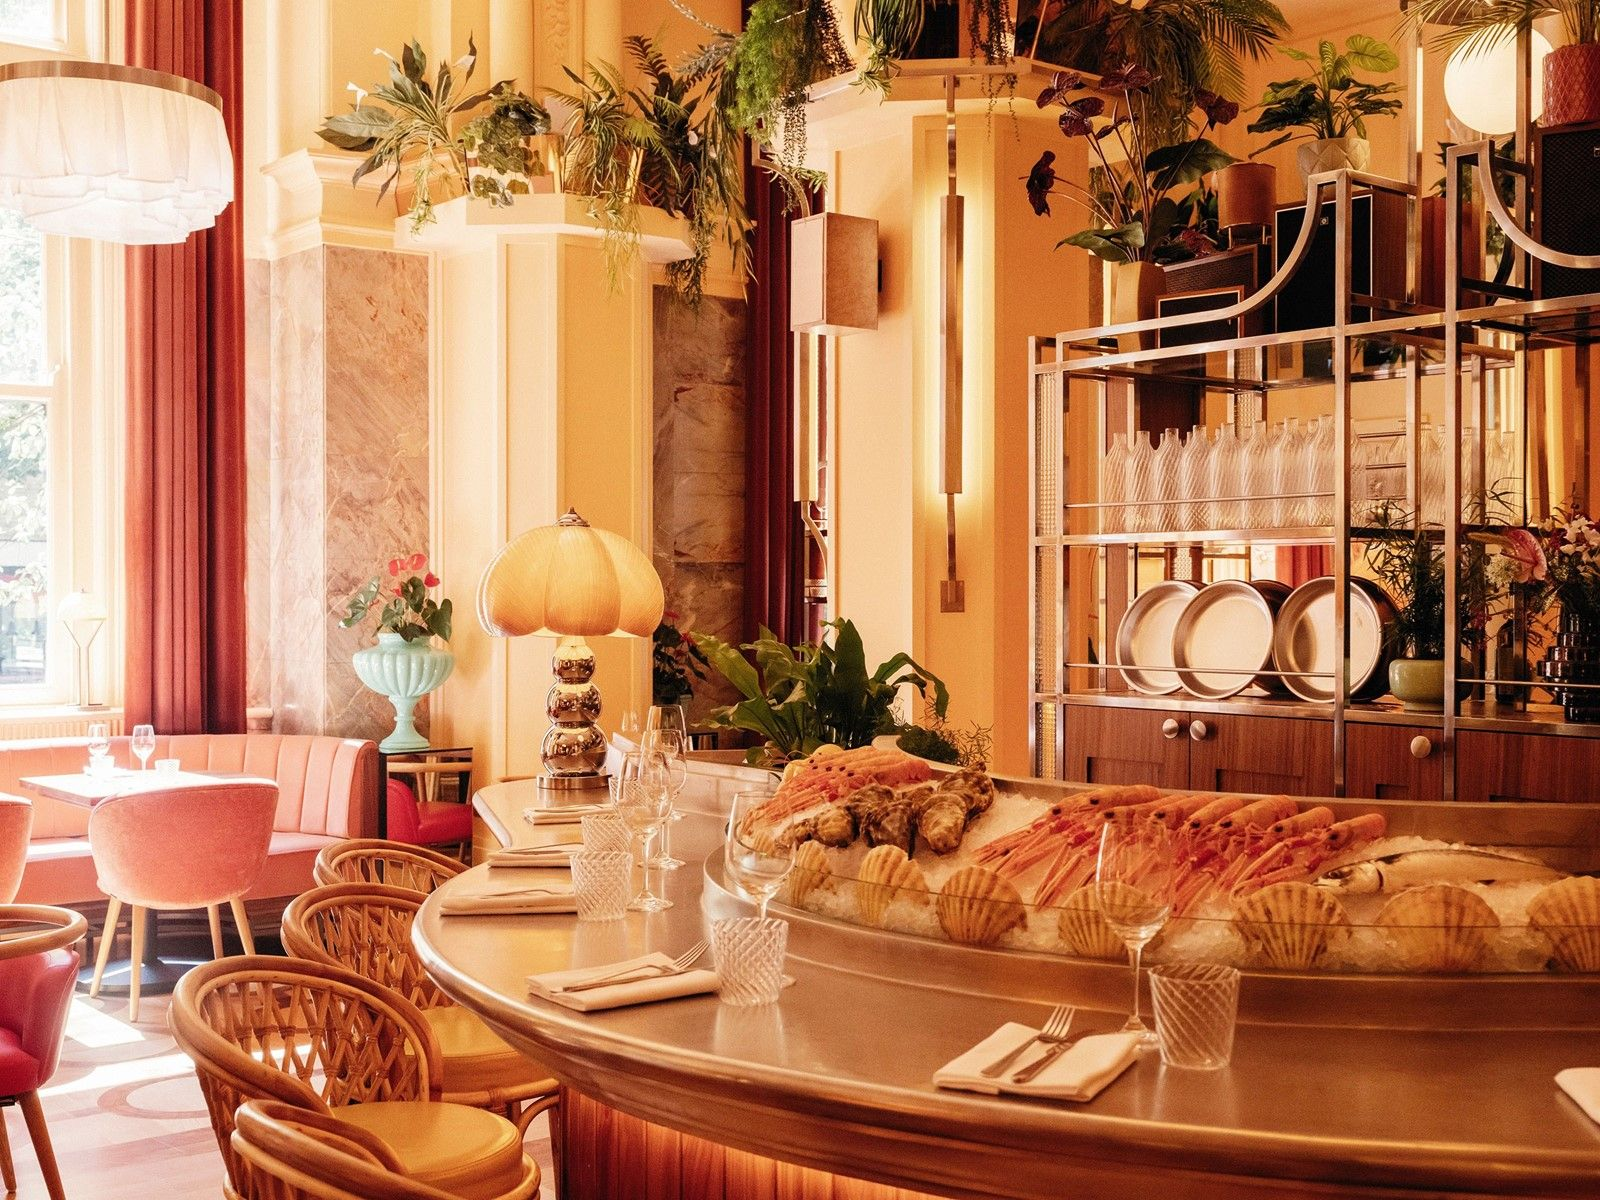 Restaurant Interiors London restaurants, Best